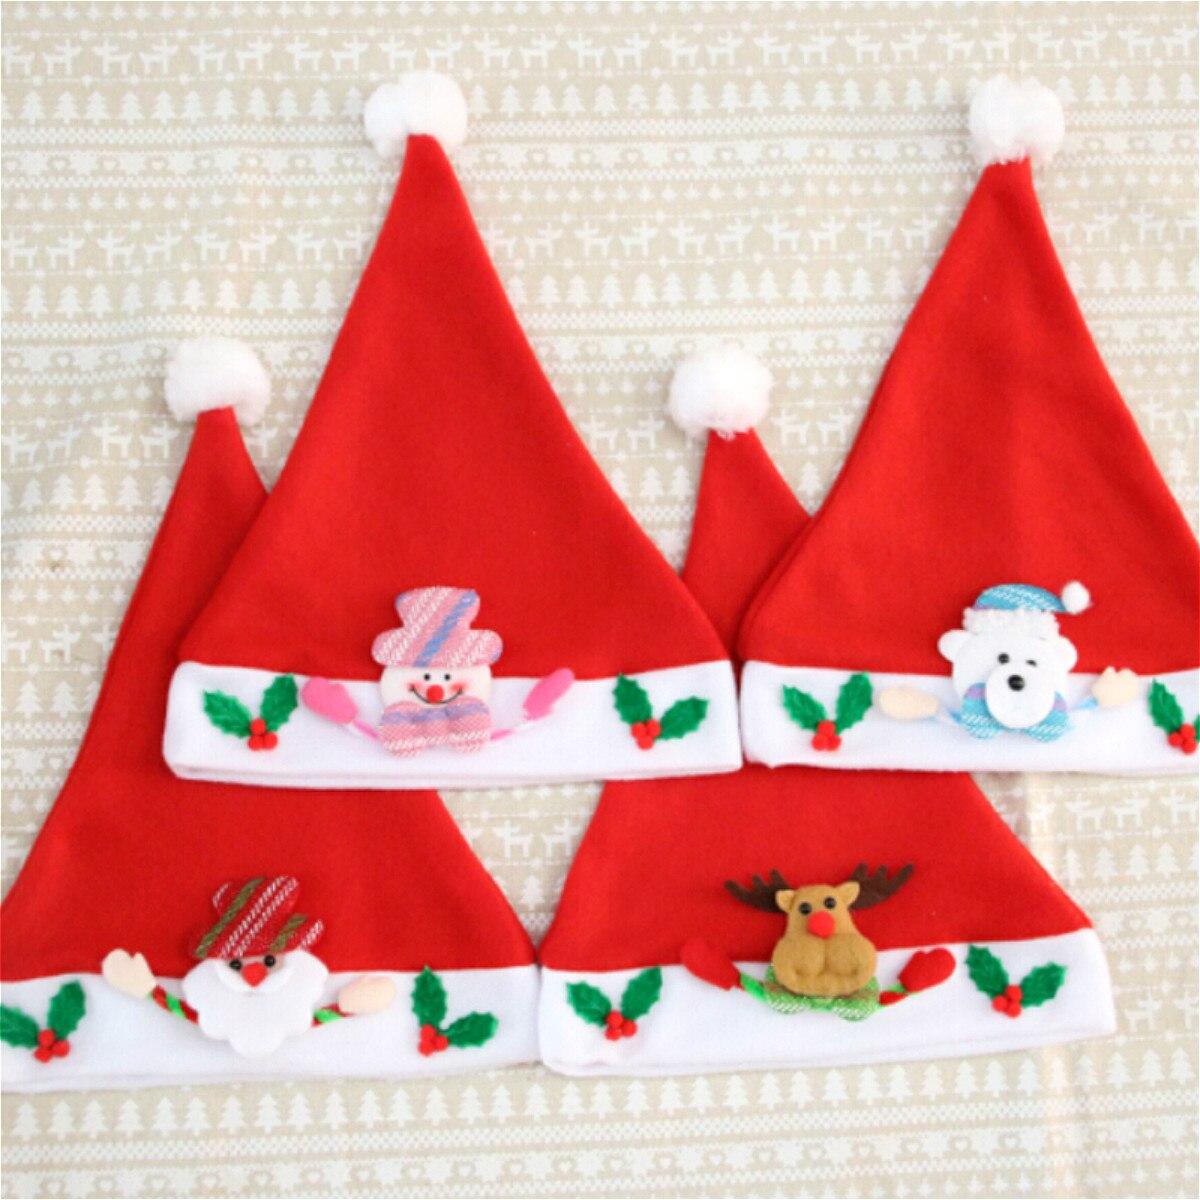 CHRISTMAS KIDS BABY HAT SANTA CLAUS REINDEER SNOWMAN SOFT CAPS HOT